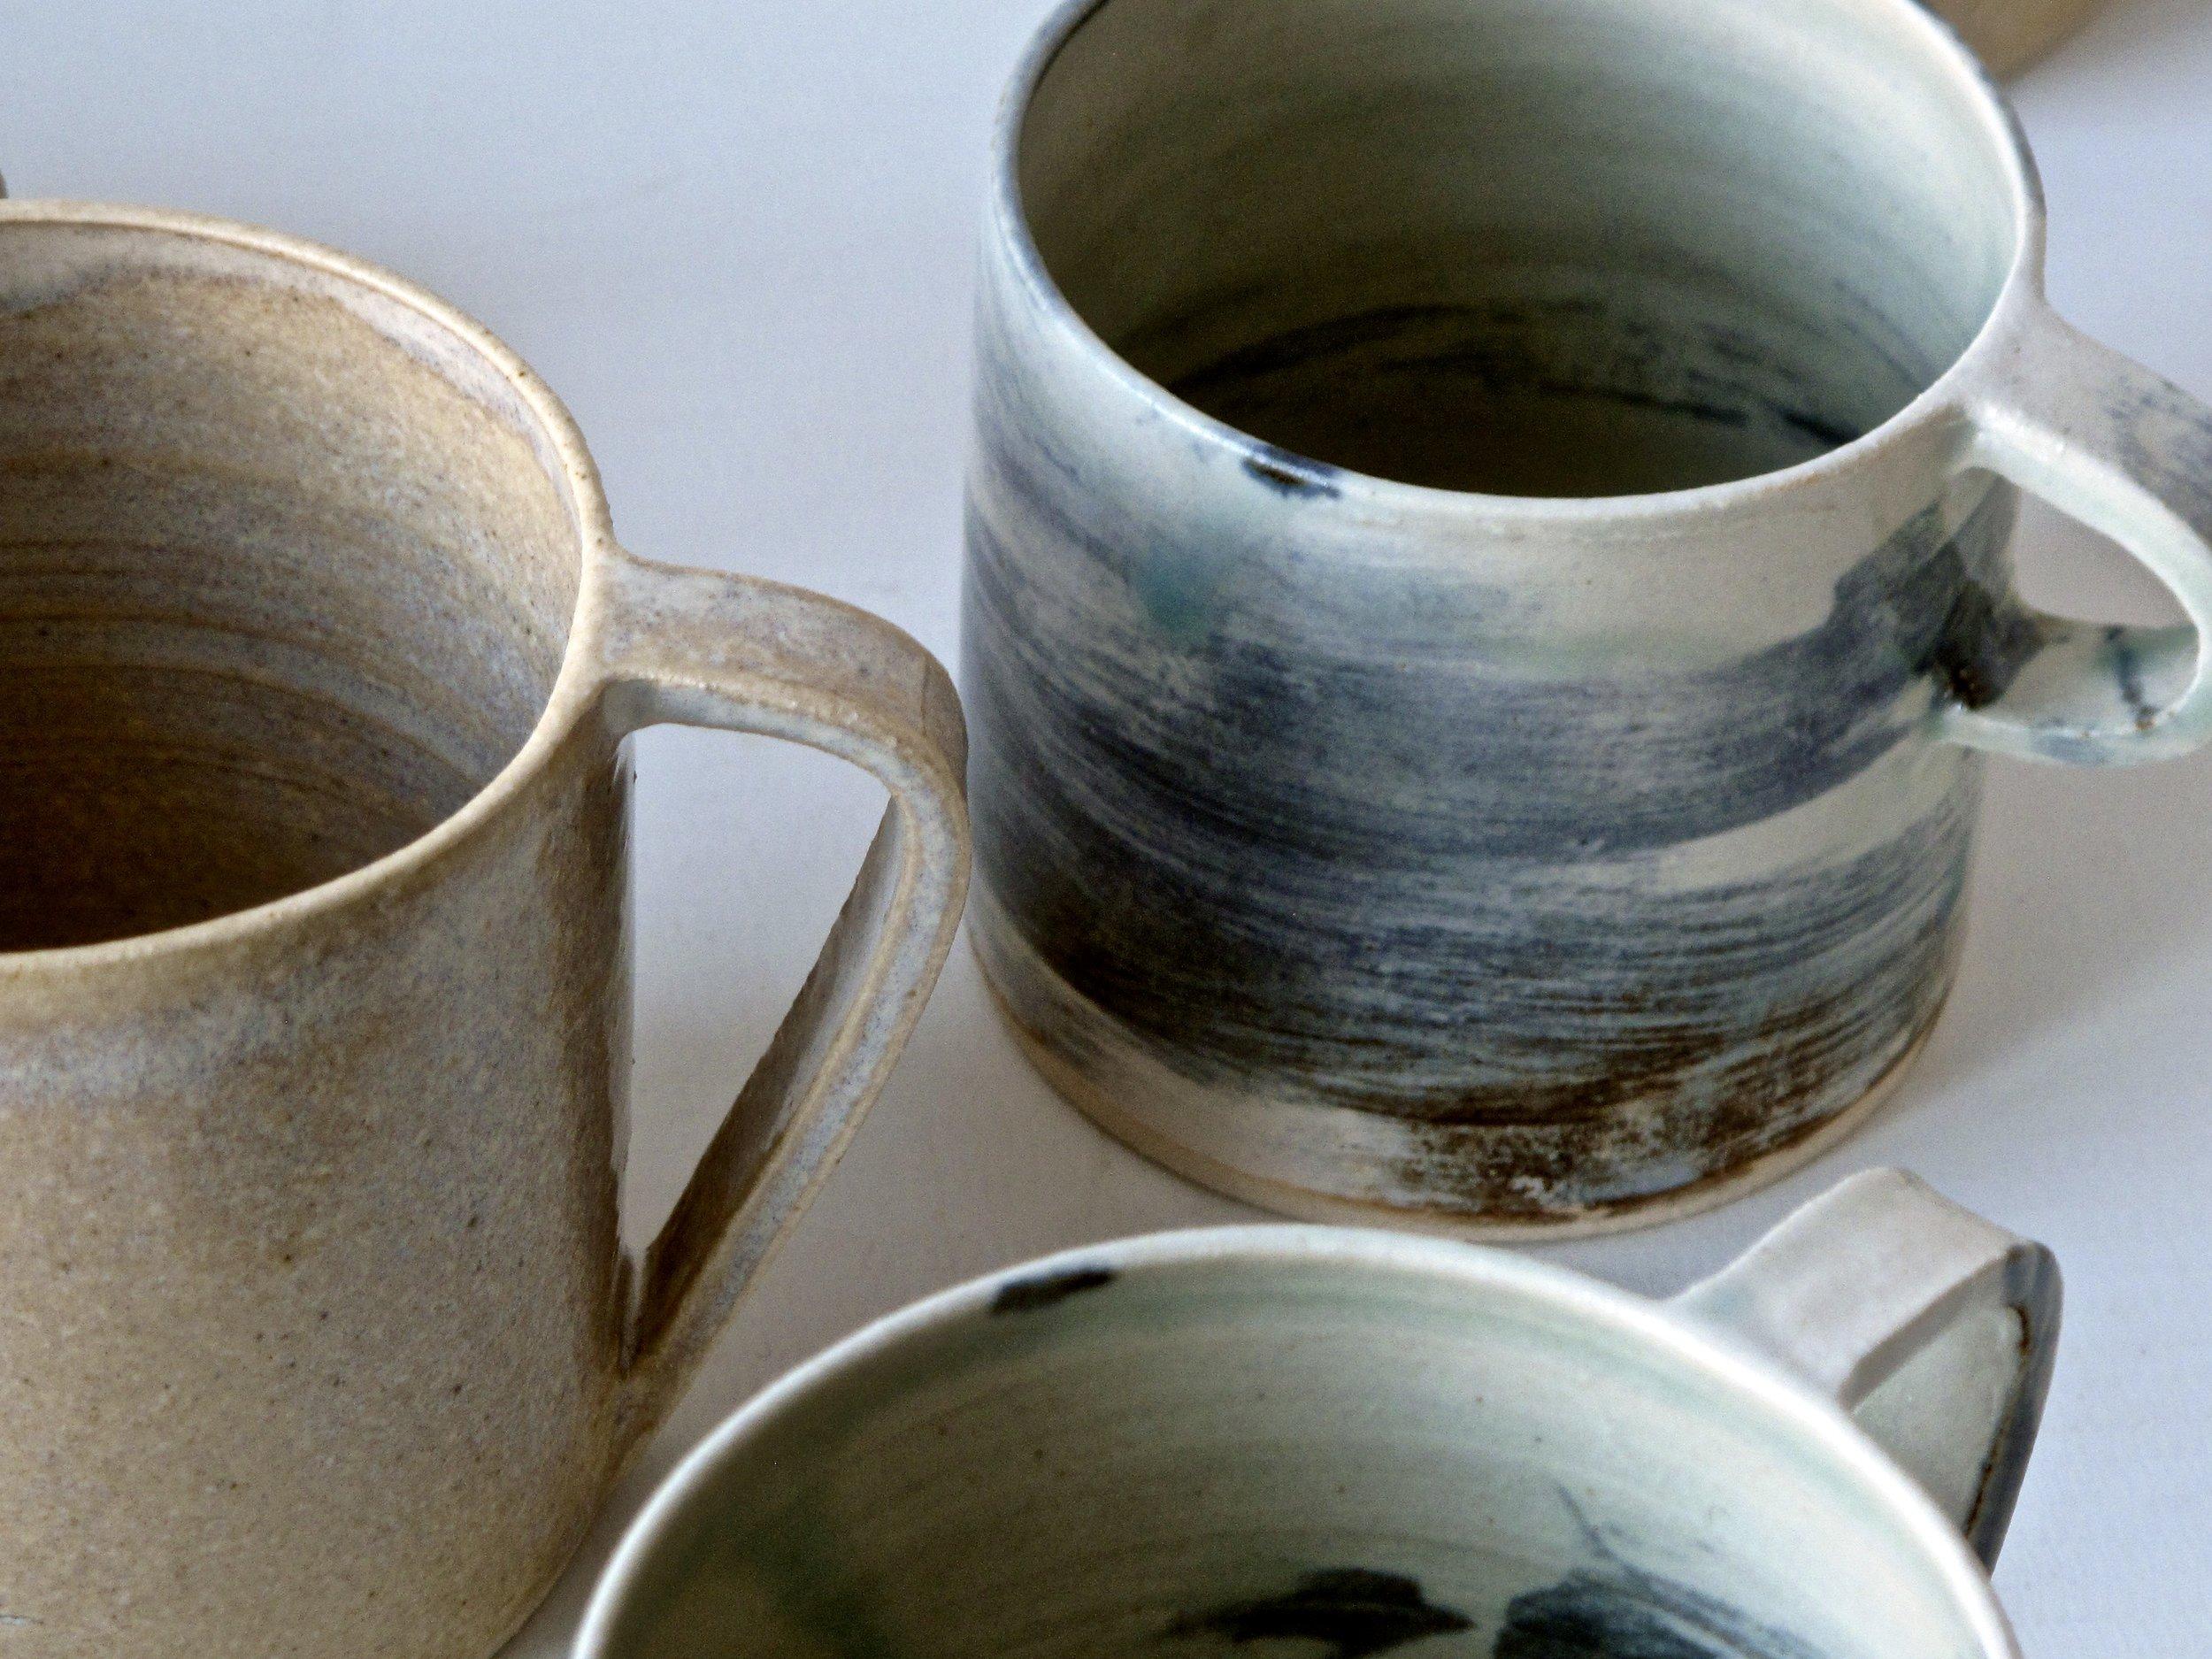 Mugs    Tea  | £28 | ⌀8.5cm H8cm   Americano  | £24 | ⌀7.5cm H7cm   Espresso  | £18 | ⌀7cm H6cm approx. Choice of small or long handle.